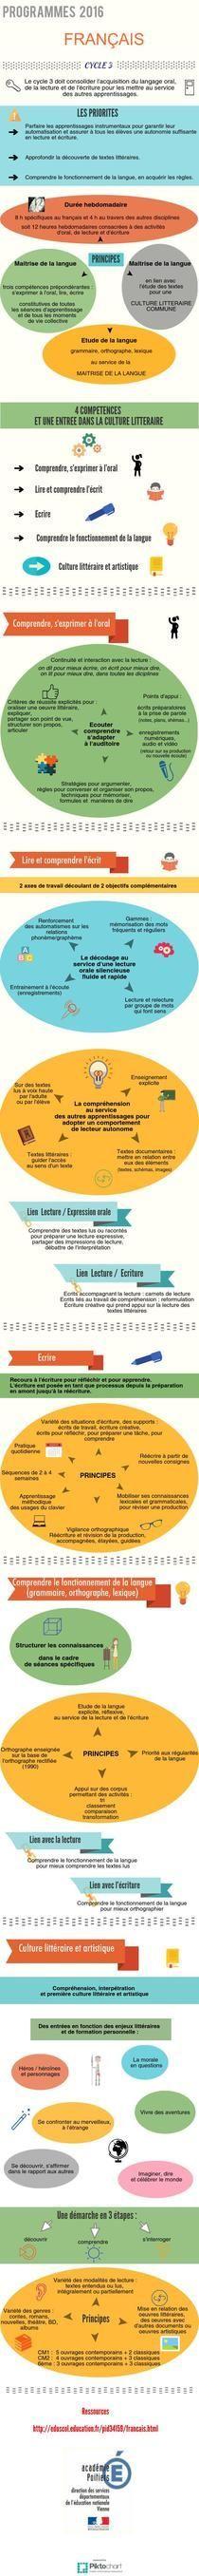 Français Cycle 3 | Piktochart Infographic Editor